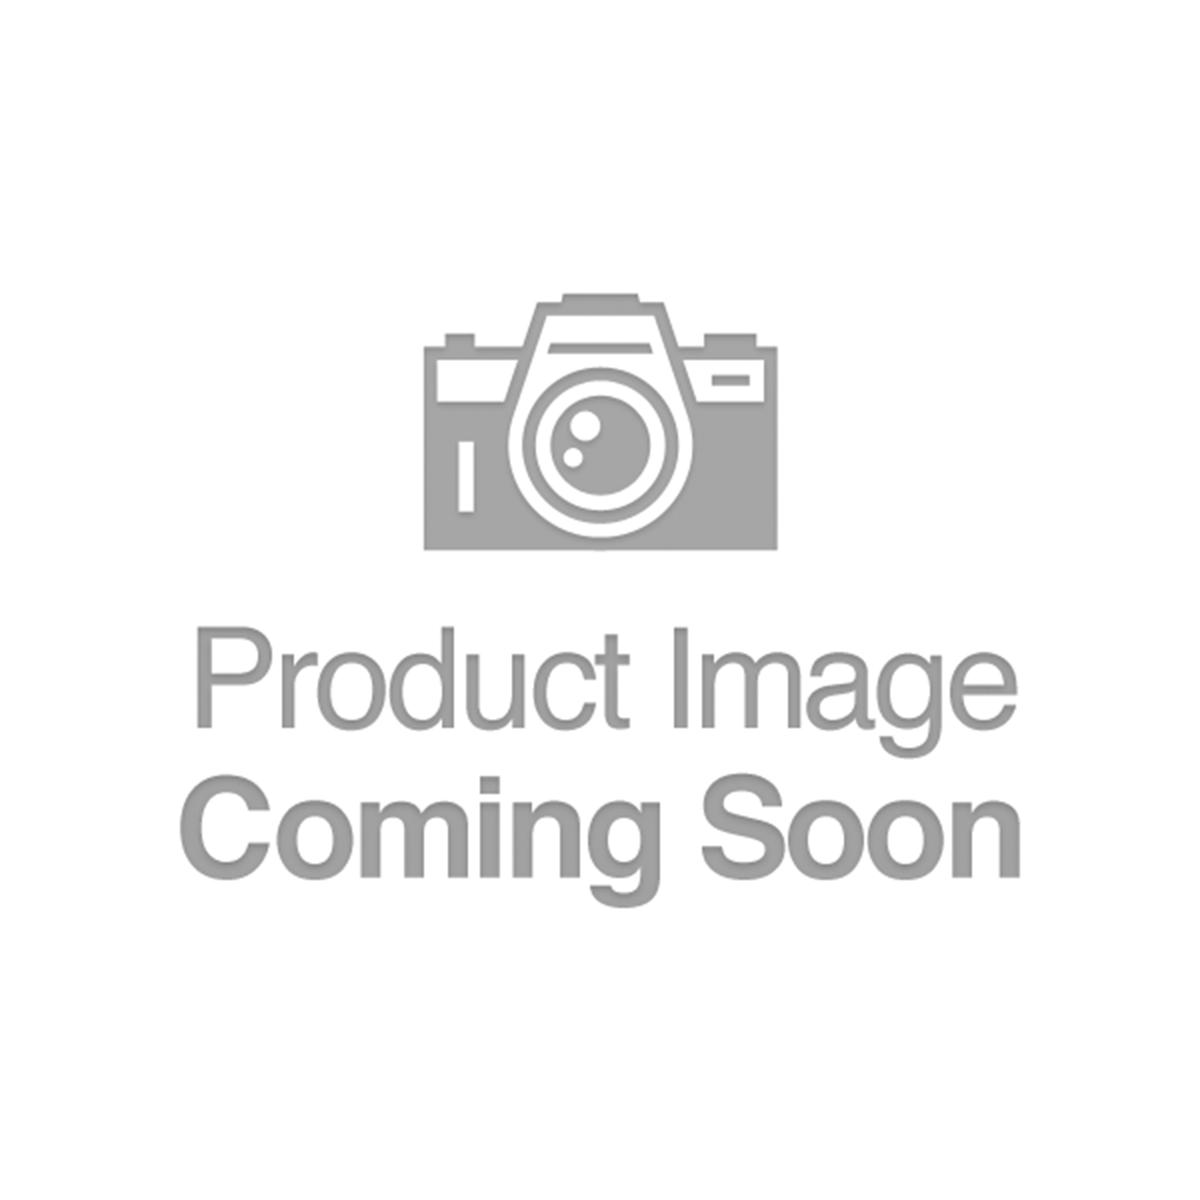 Charlottesville - Virginia - CH 10618 - FR 657 - PCGS 15